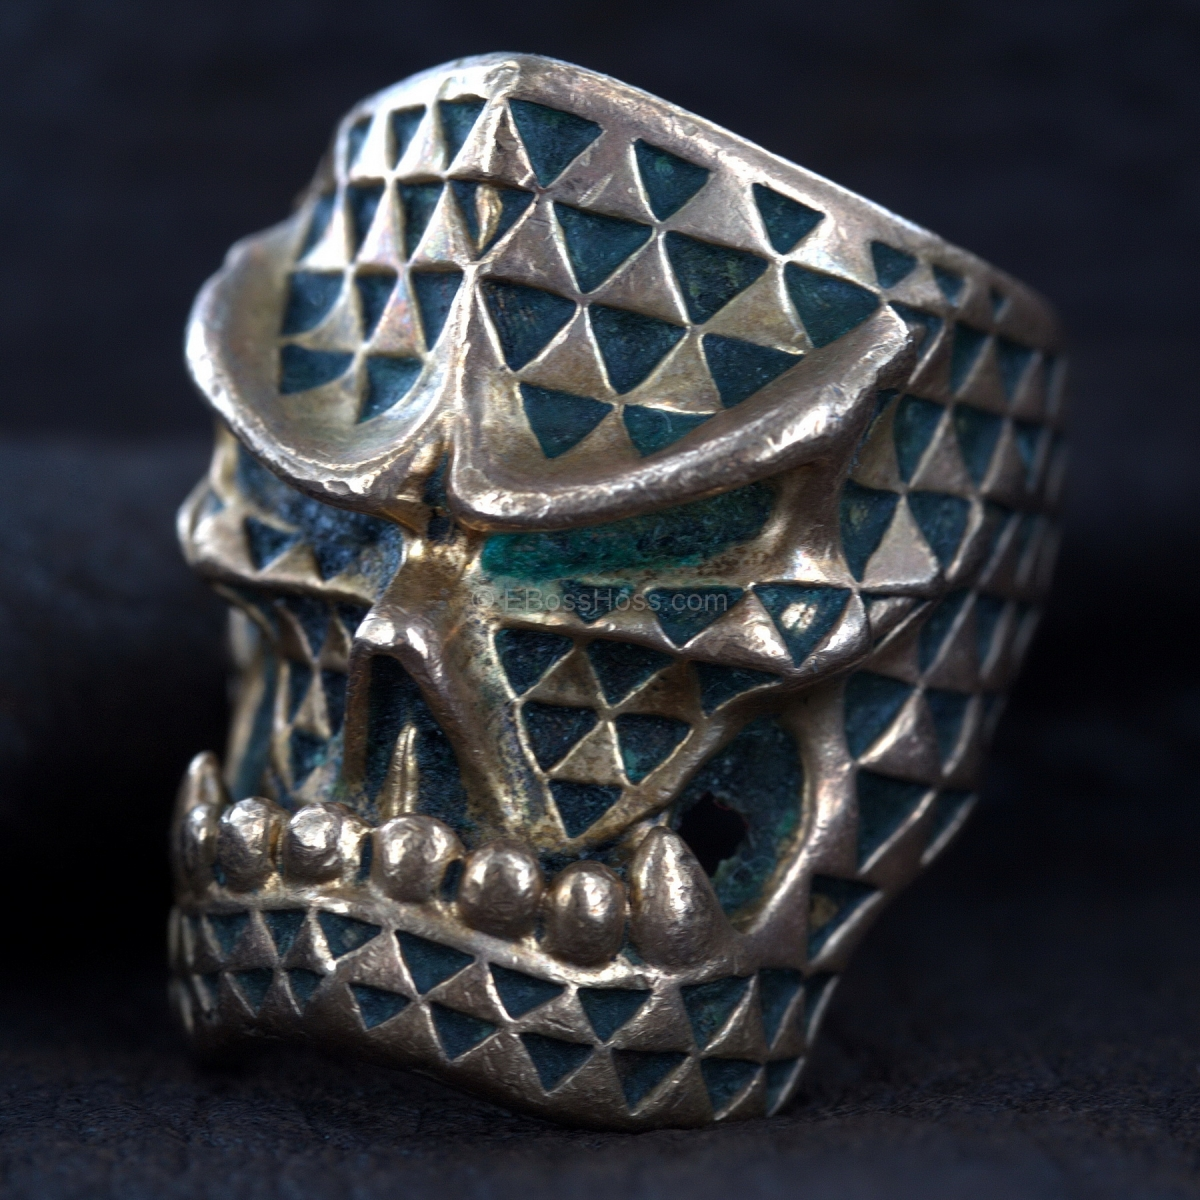 Starlingear Bronze Delta Kaze Ring - Puncher